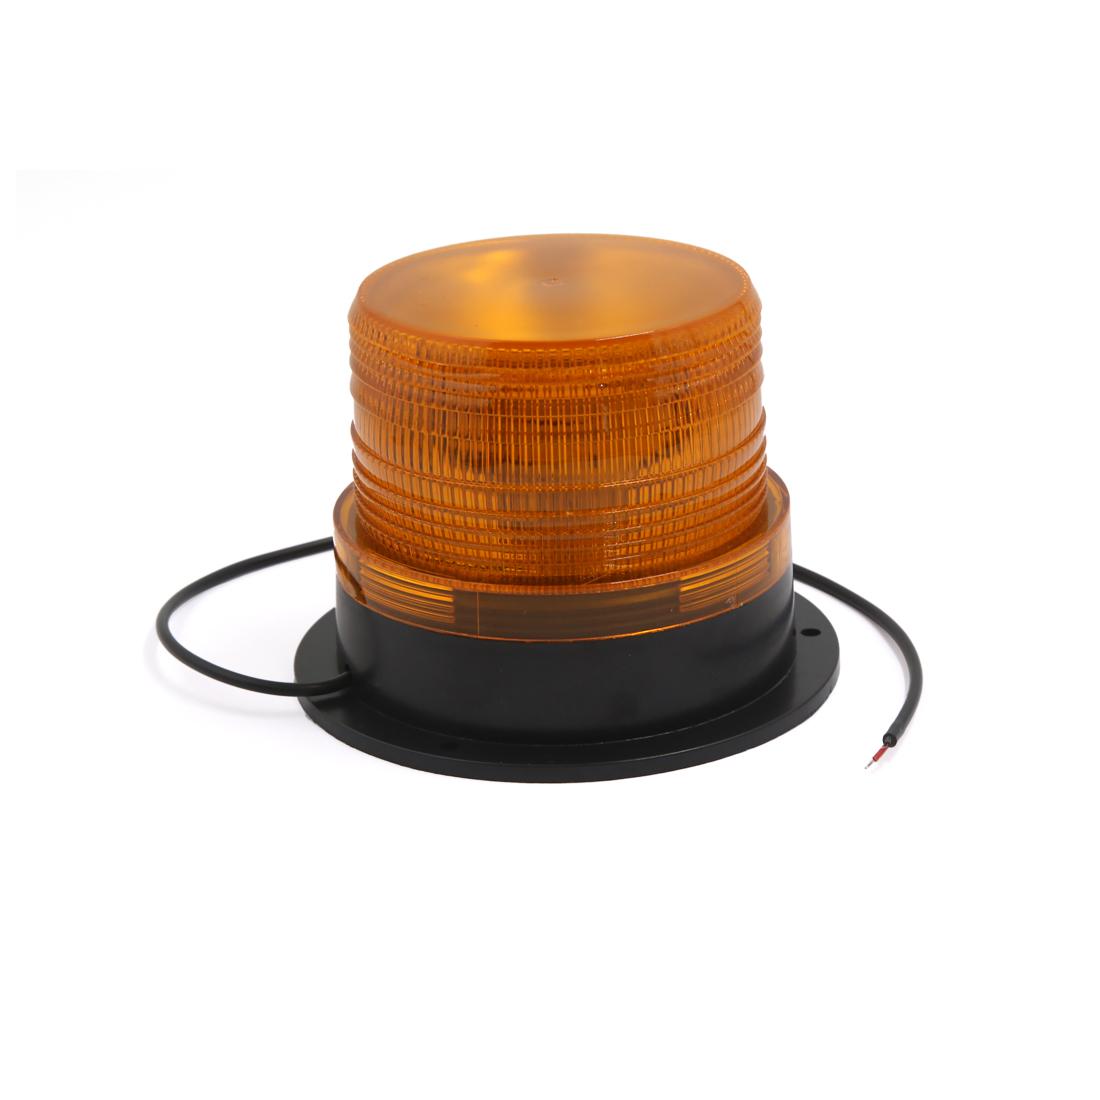 Car Bus Beacon Plastic Yellow Flash Strobe Light Emergency Warning Lamp DC 12V